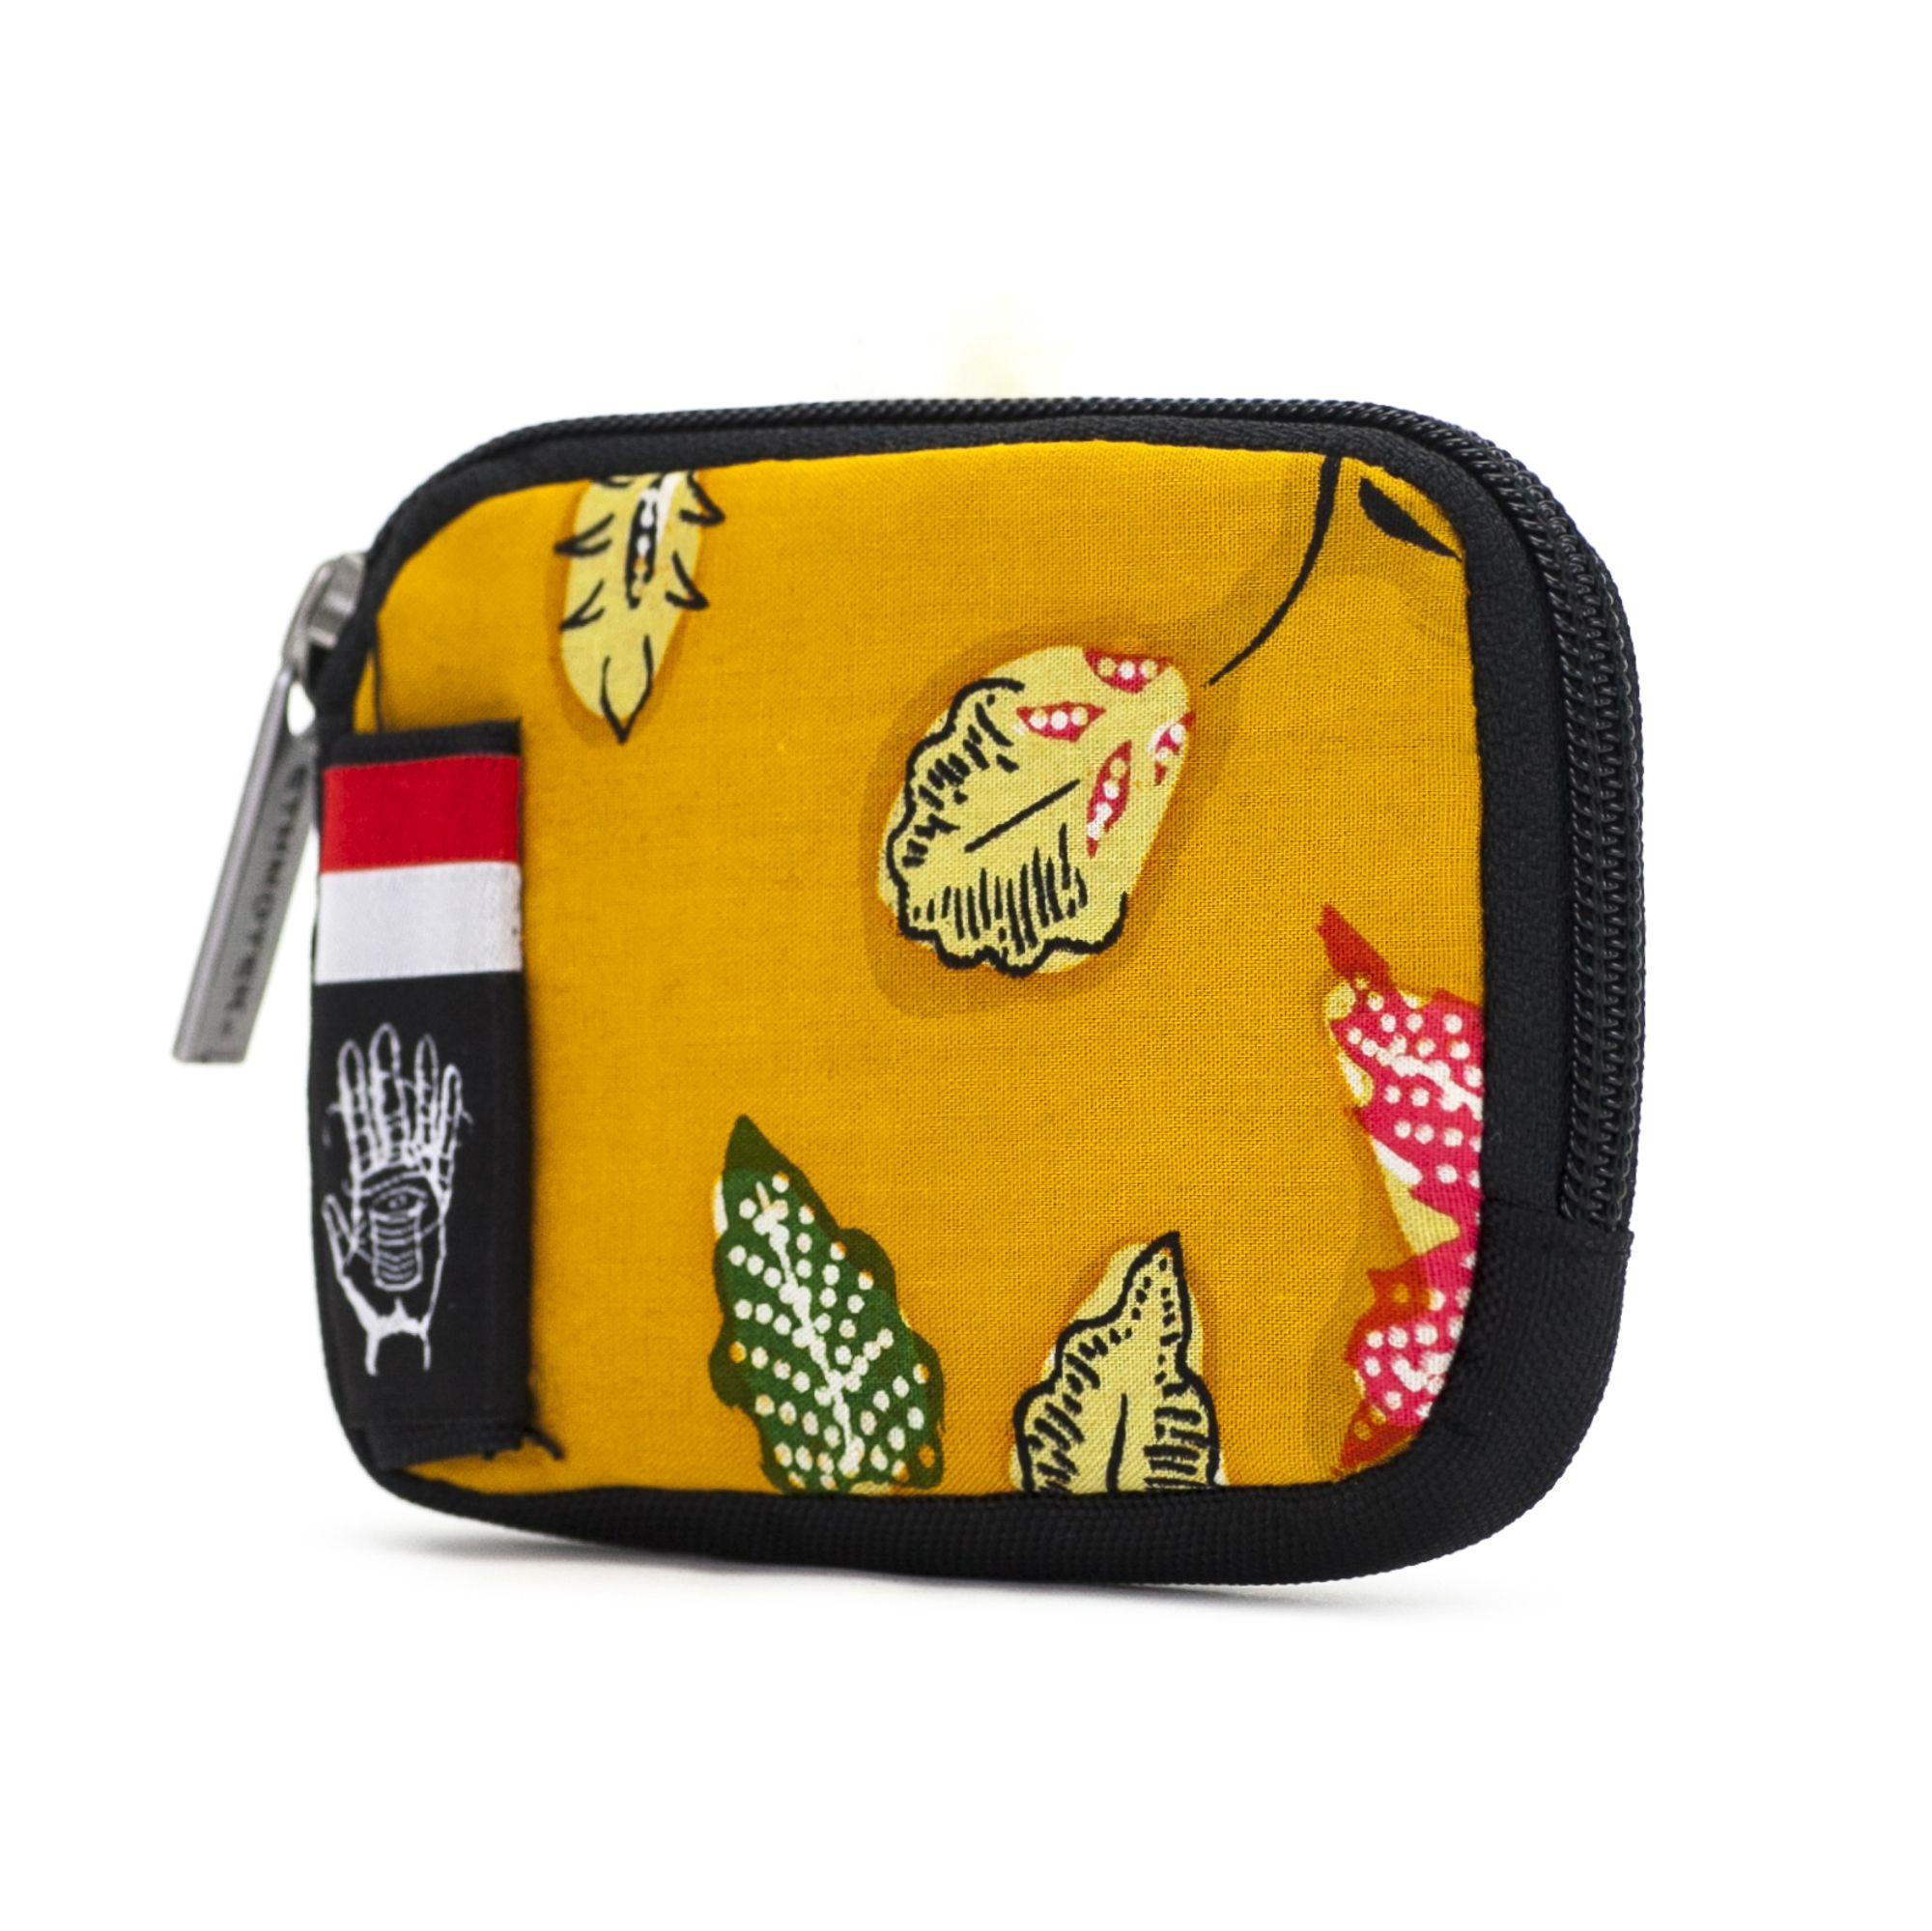 Coyopa Pouch Geldbörse RFID Block Indonesia 12